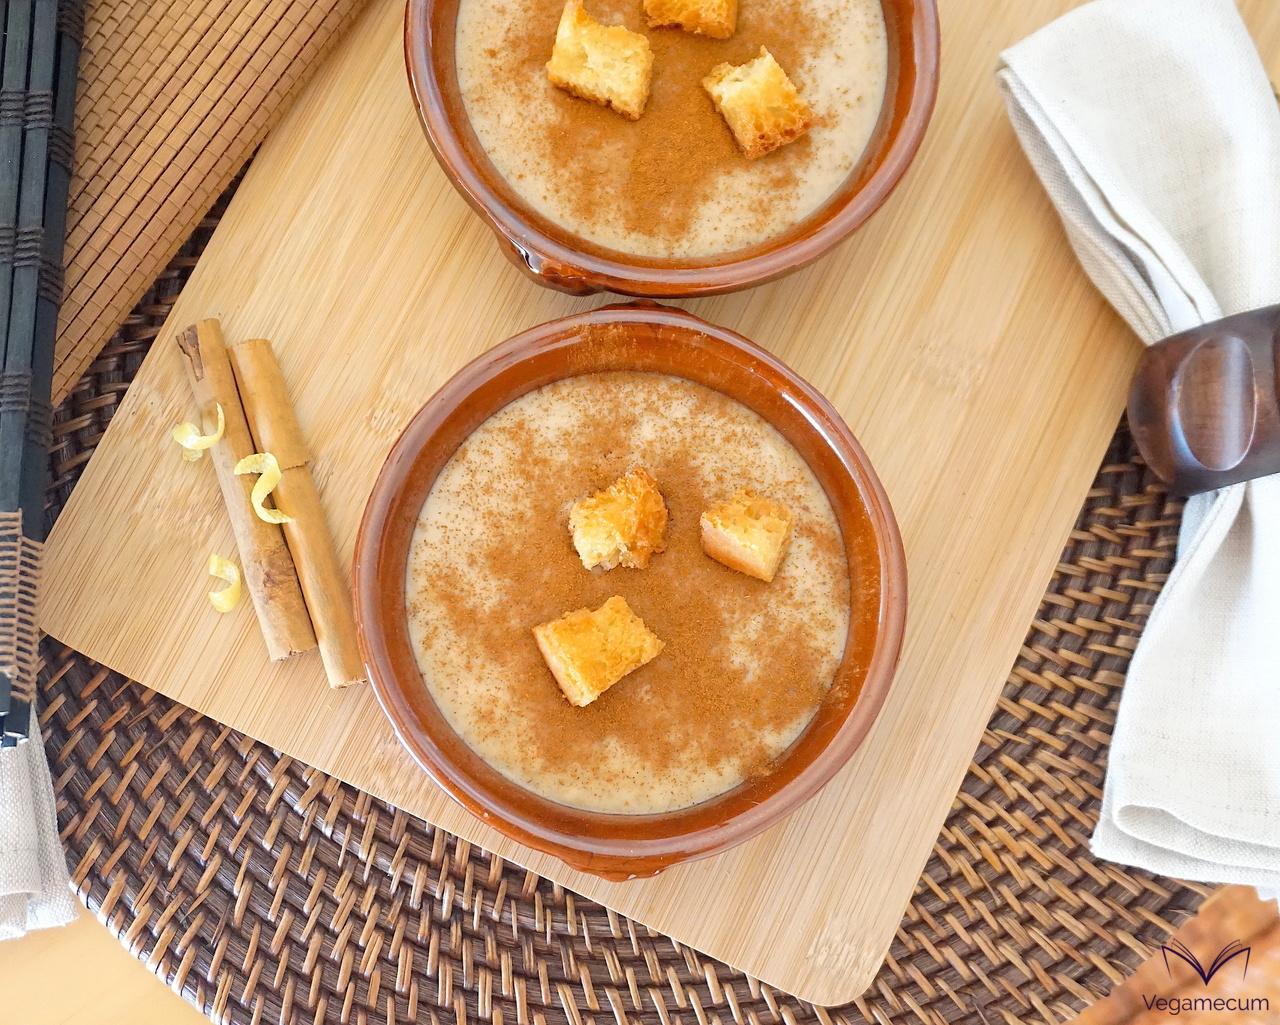 Vegan All Saints' Day sweet porridge